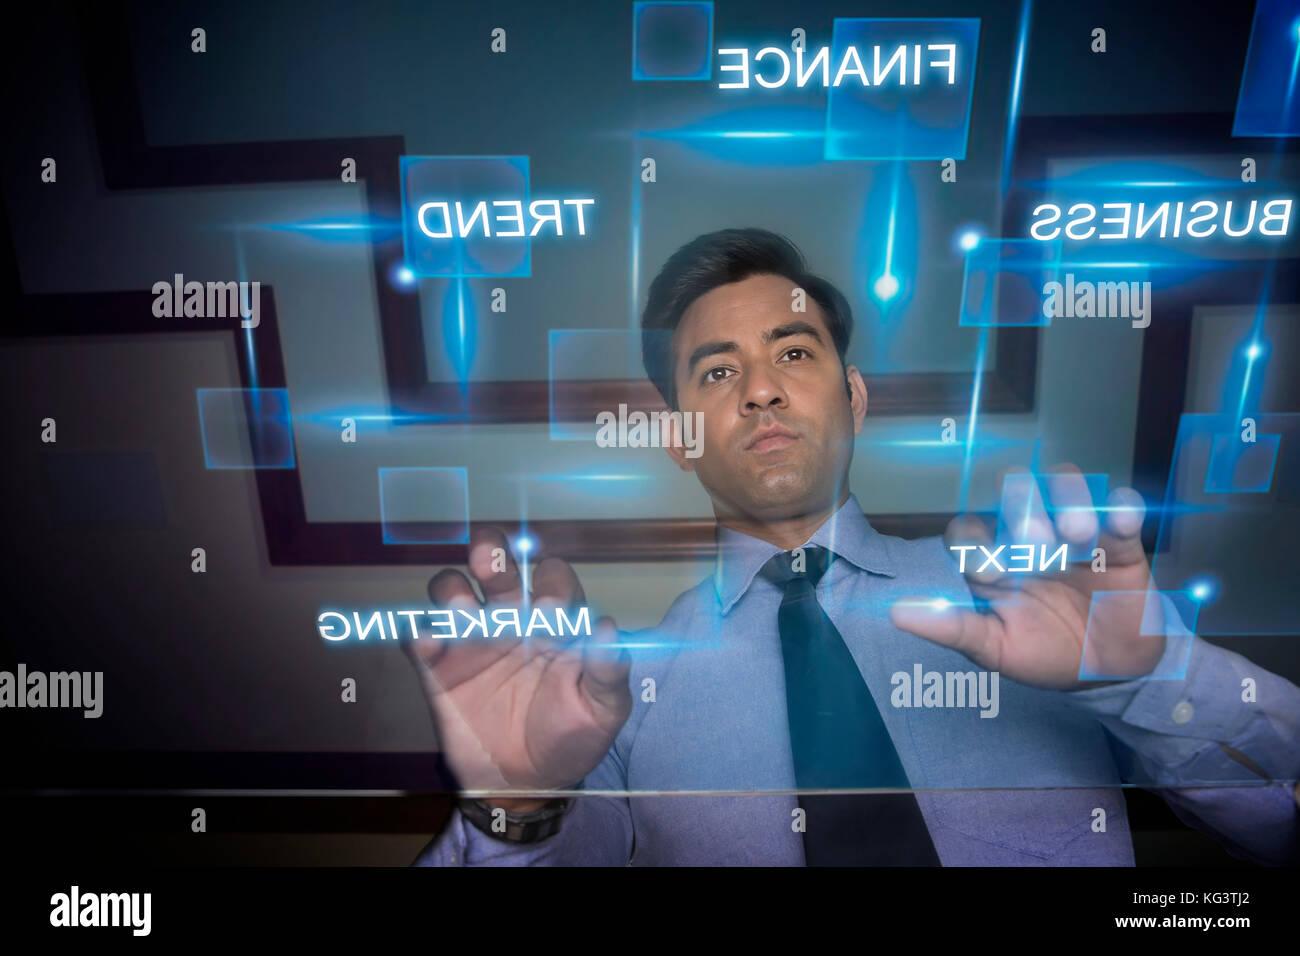 Businessman using futuristic computer keyboard - Stock Image